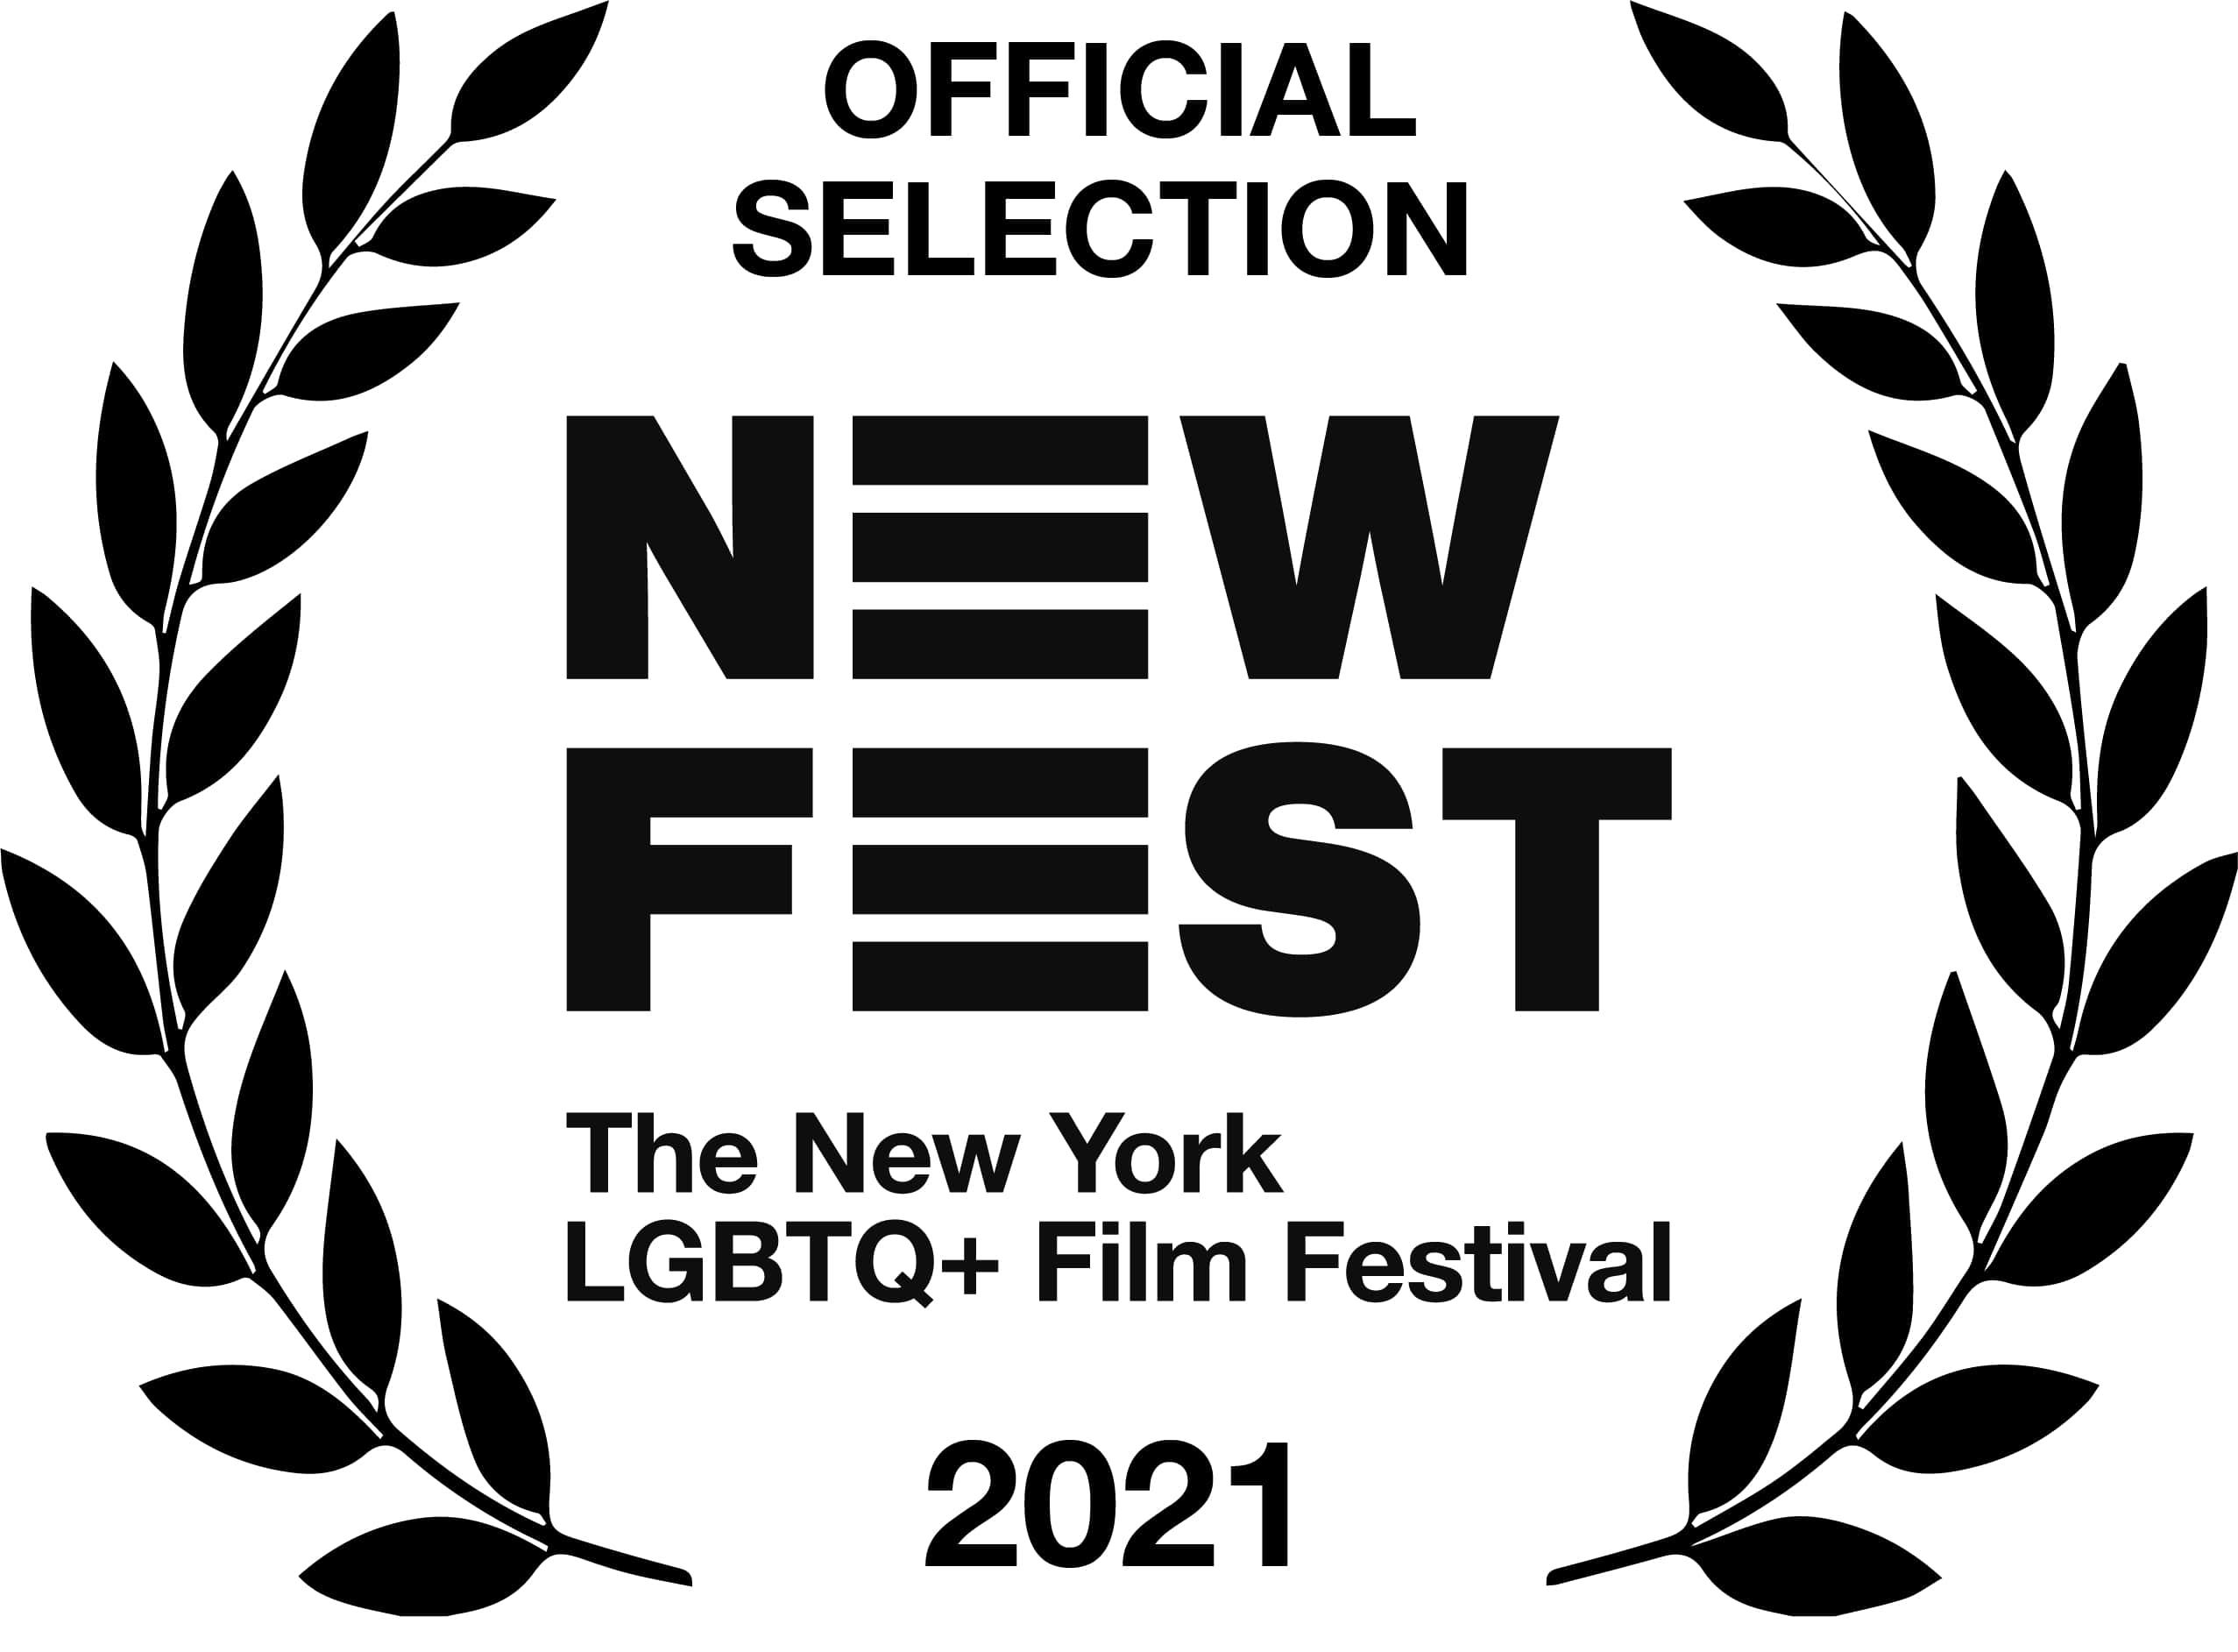 NEWfest - New York LGBTQ+ Film Festival